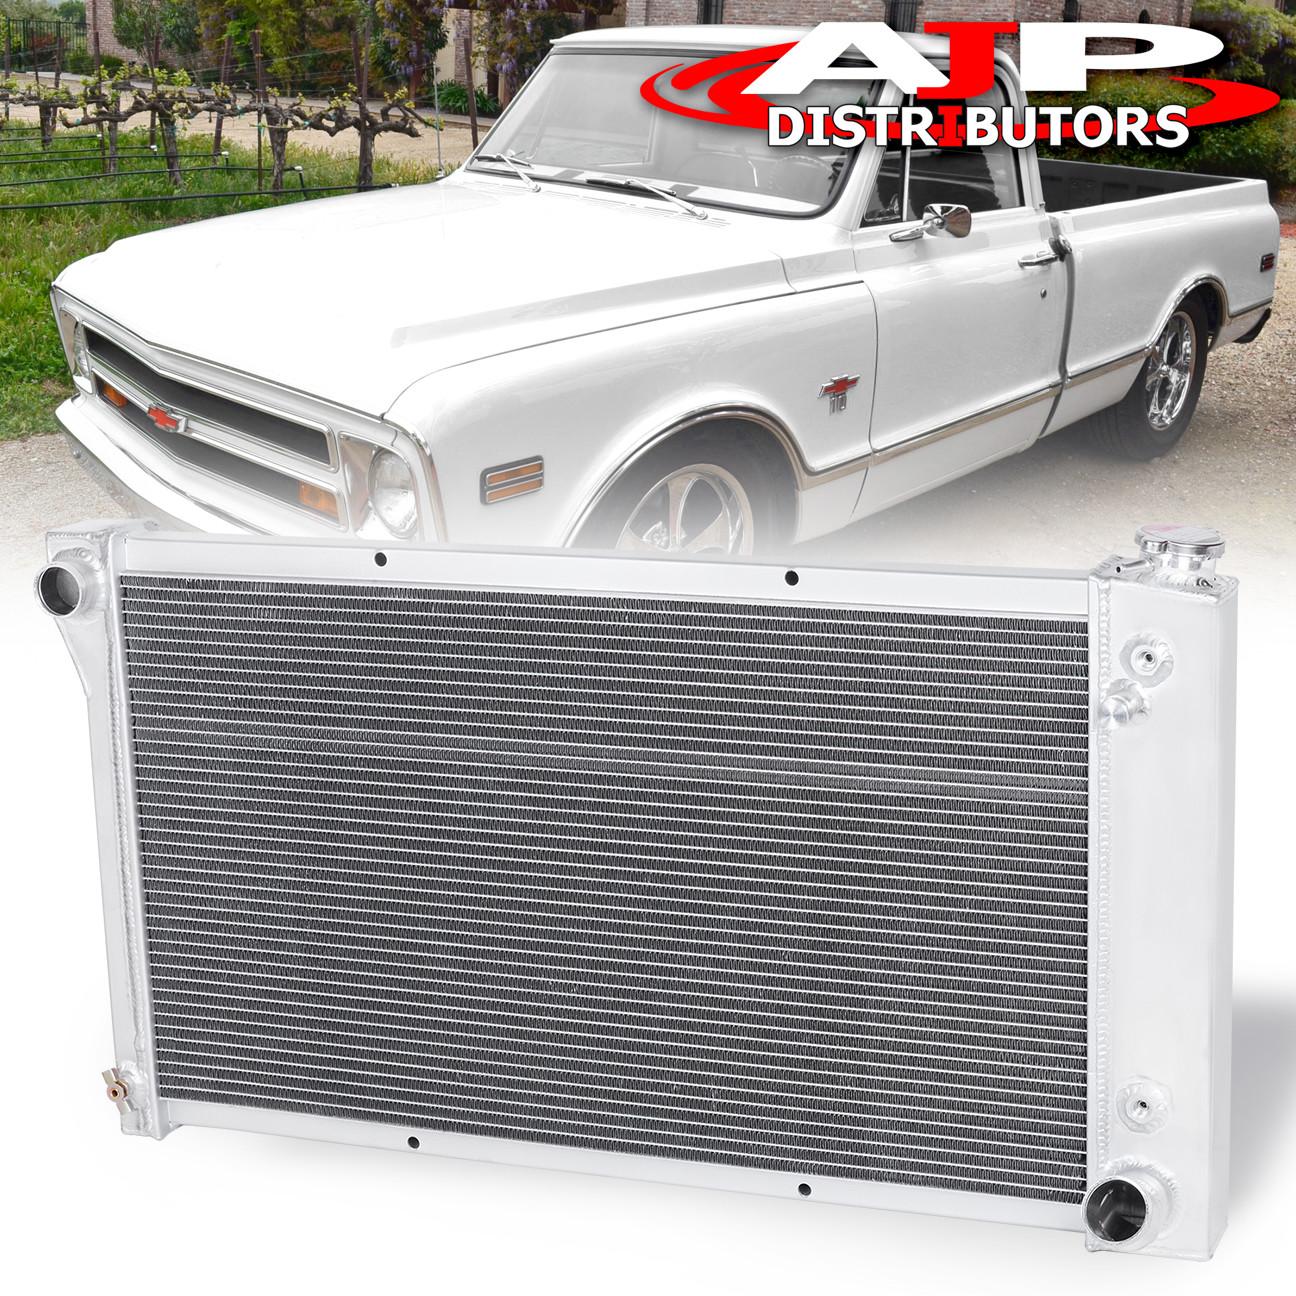 3 ROWS ALUMINUM RADIATOR FIT Base Sport Utility 4-Door V8 S10 Blazer TRI-CORE